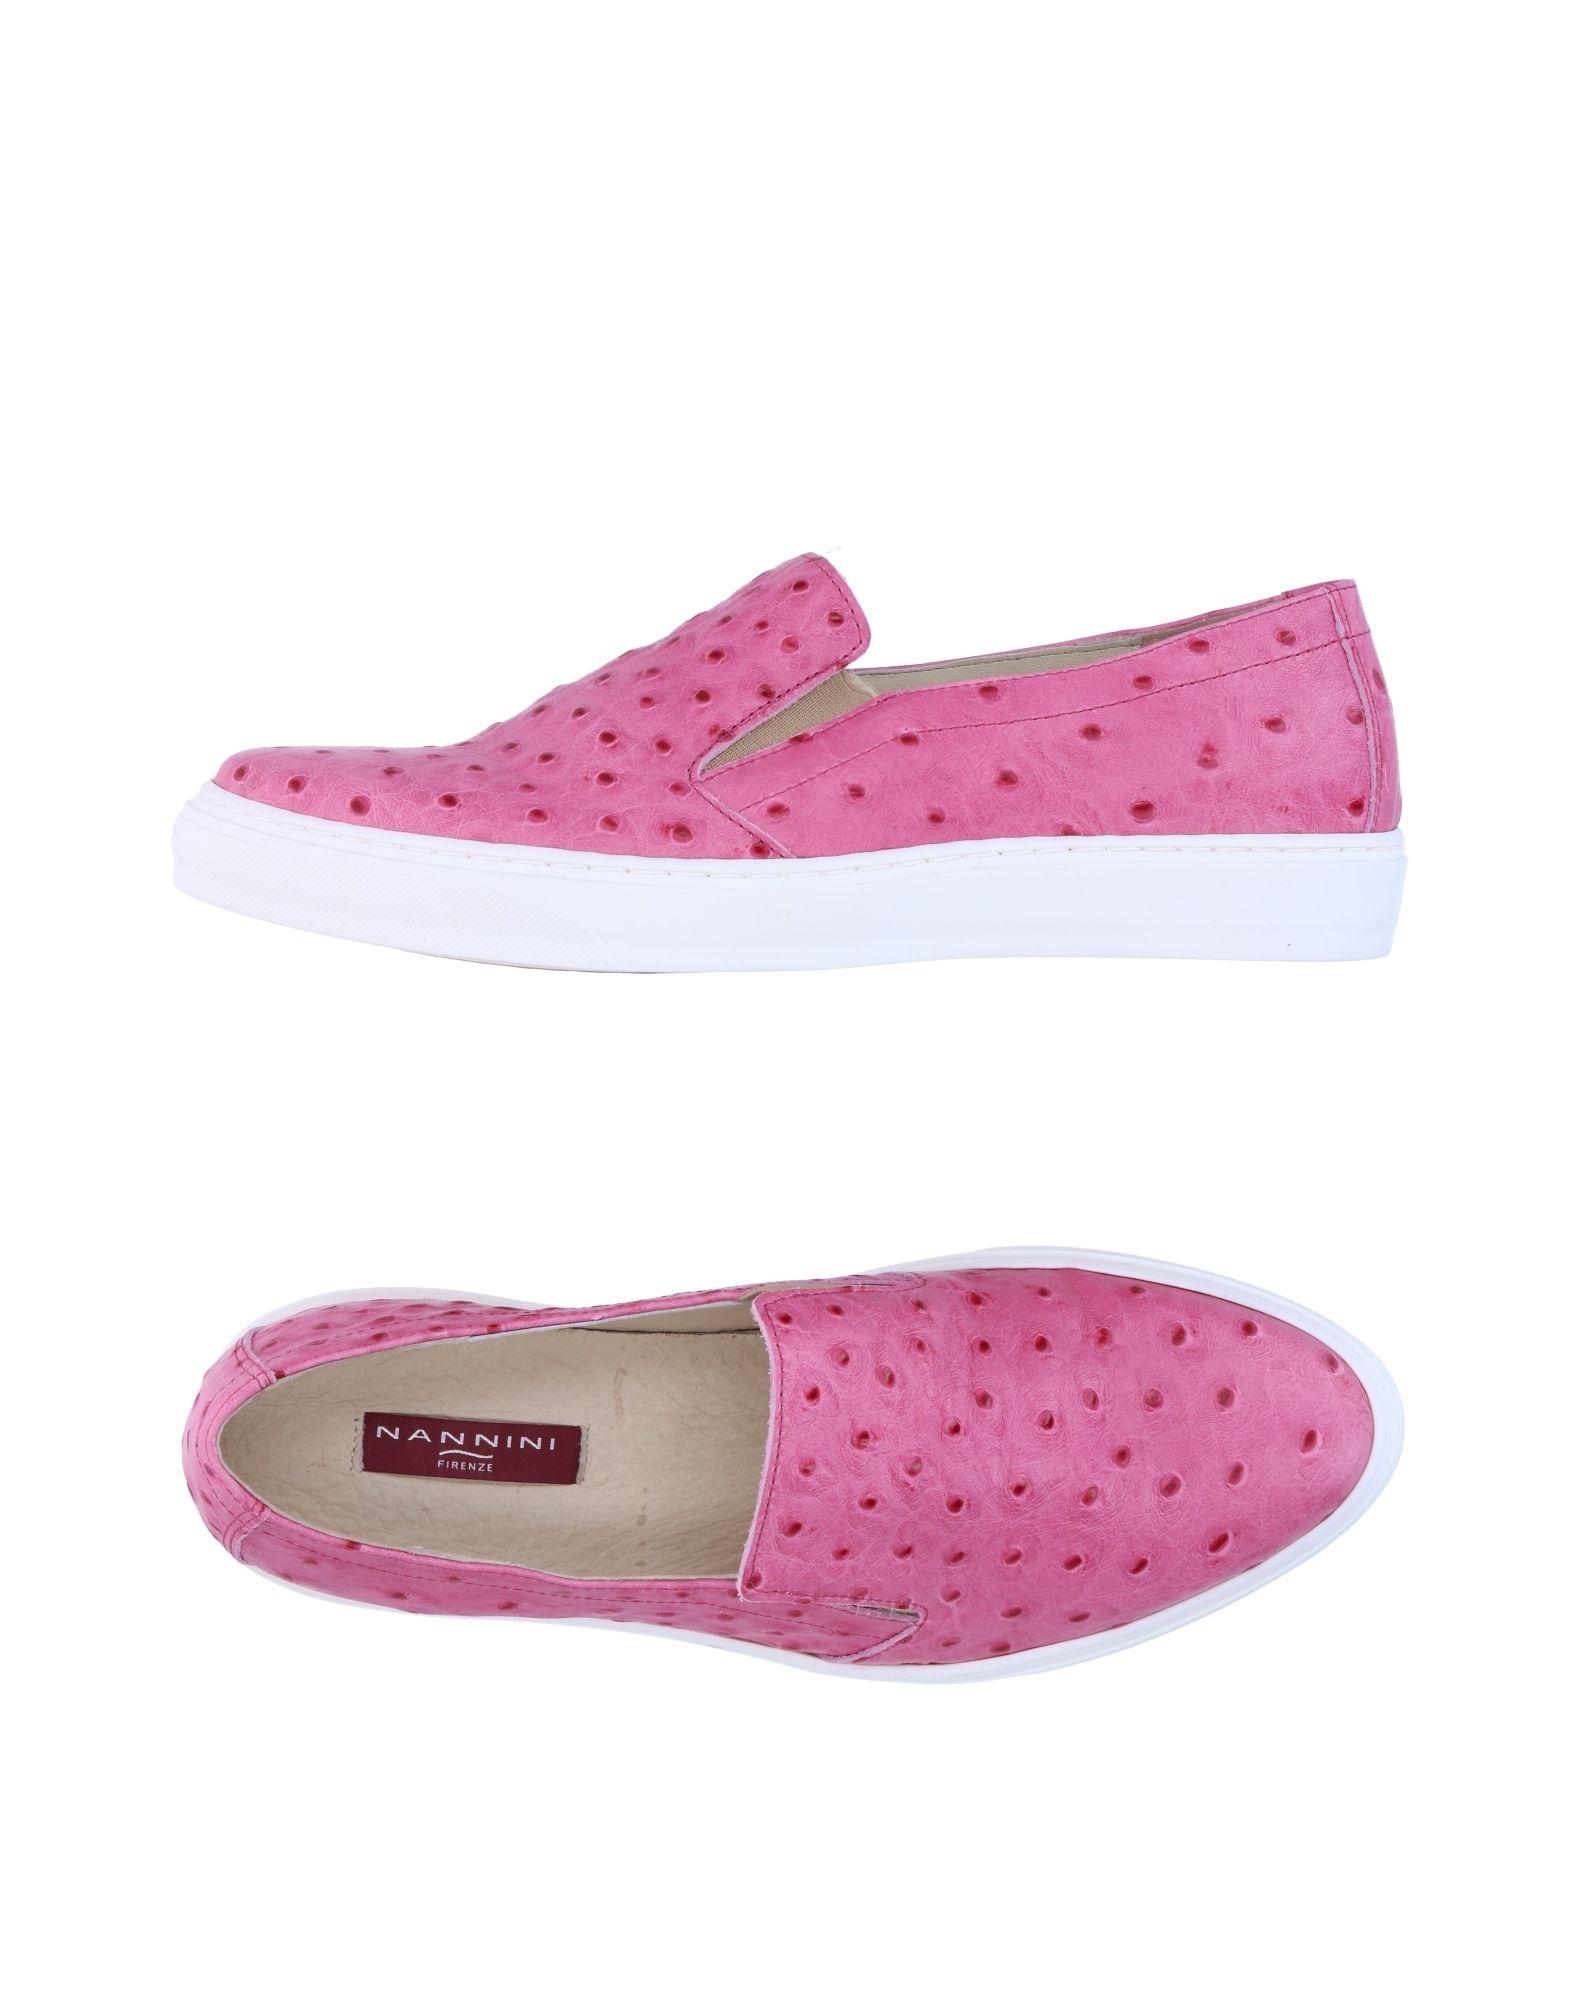 Nannini Sneakers Damen  11268895XQ Gute Qualität beliebte Schuhe